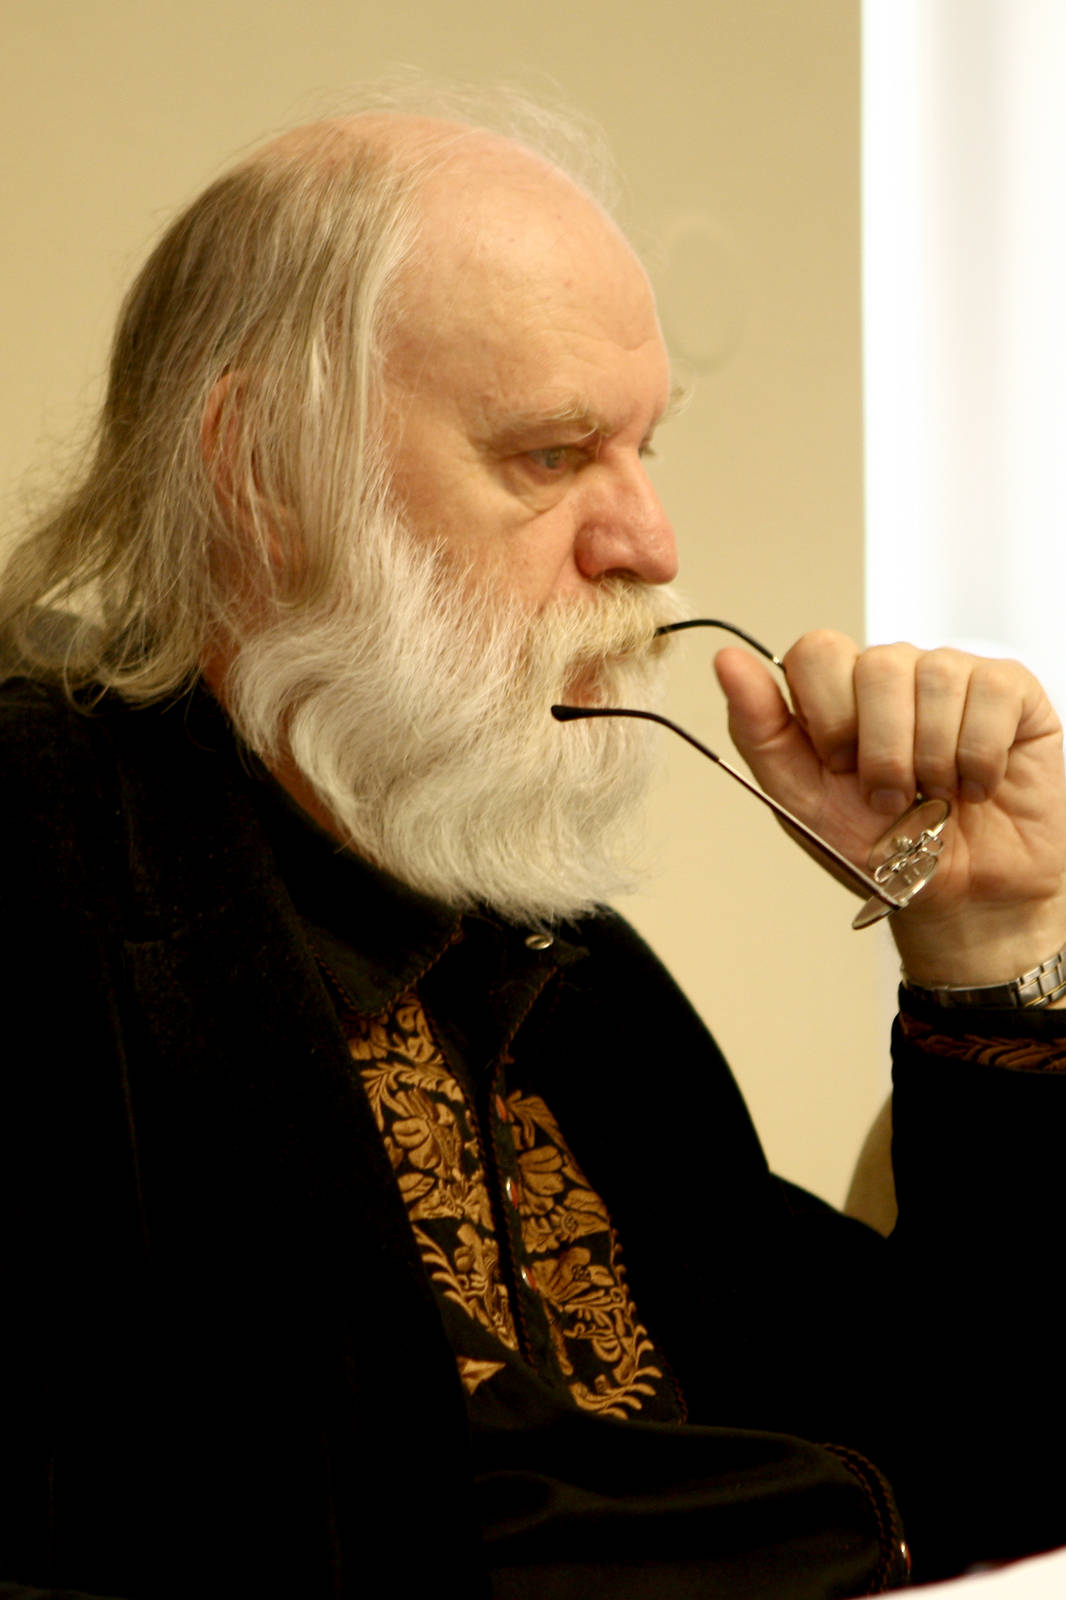 Pavel P. Ries